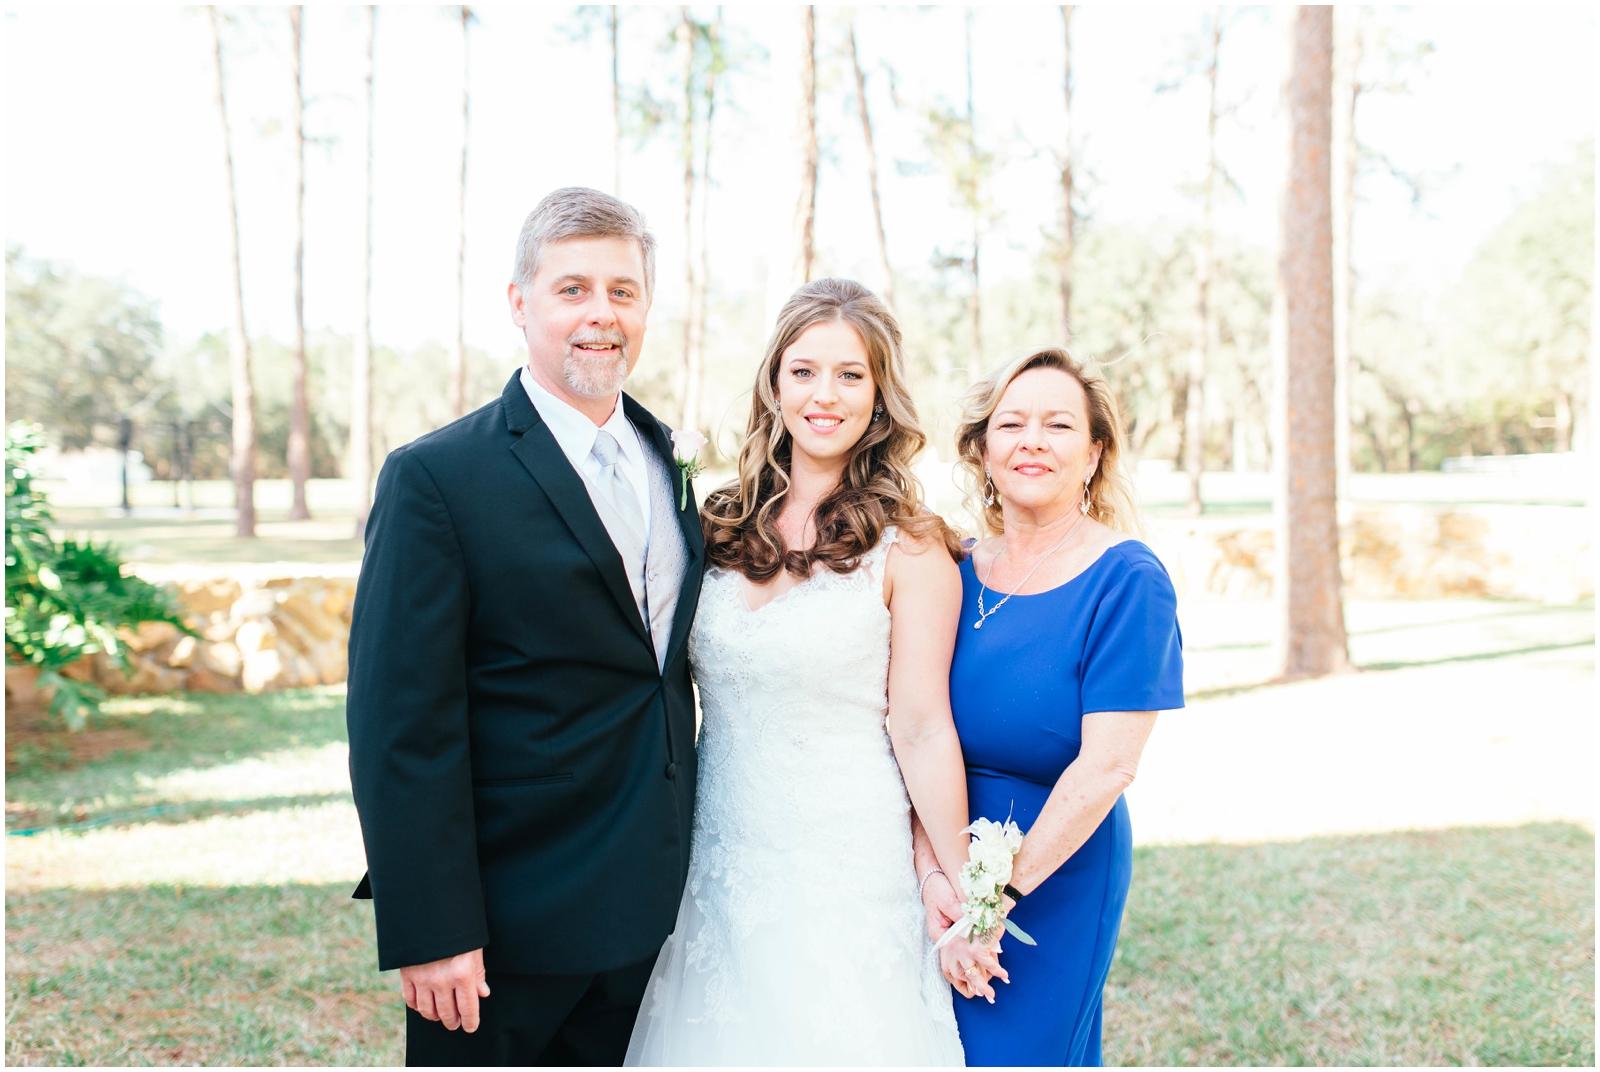 Tampa Area Wedding Venue with Southern Charm- Stonebridge Events_0269.jpg